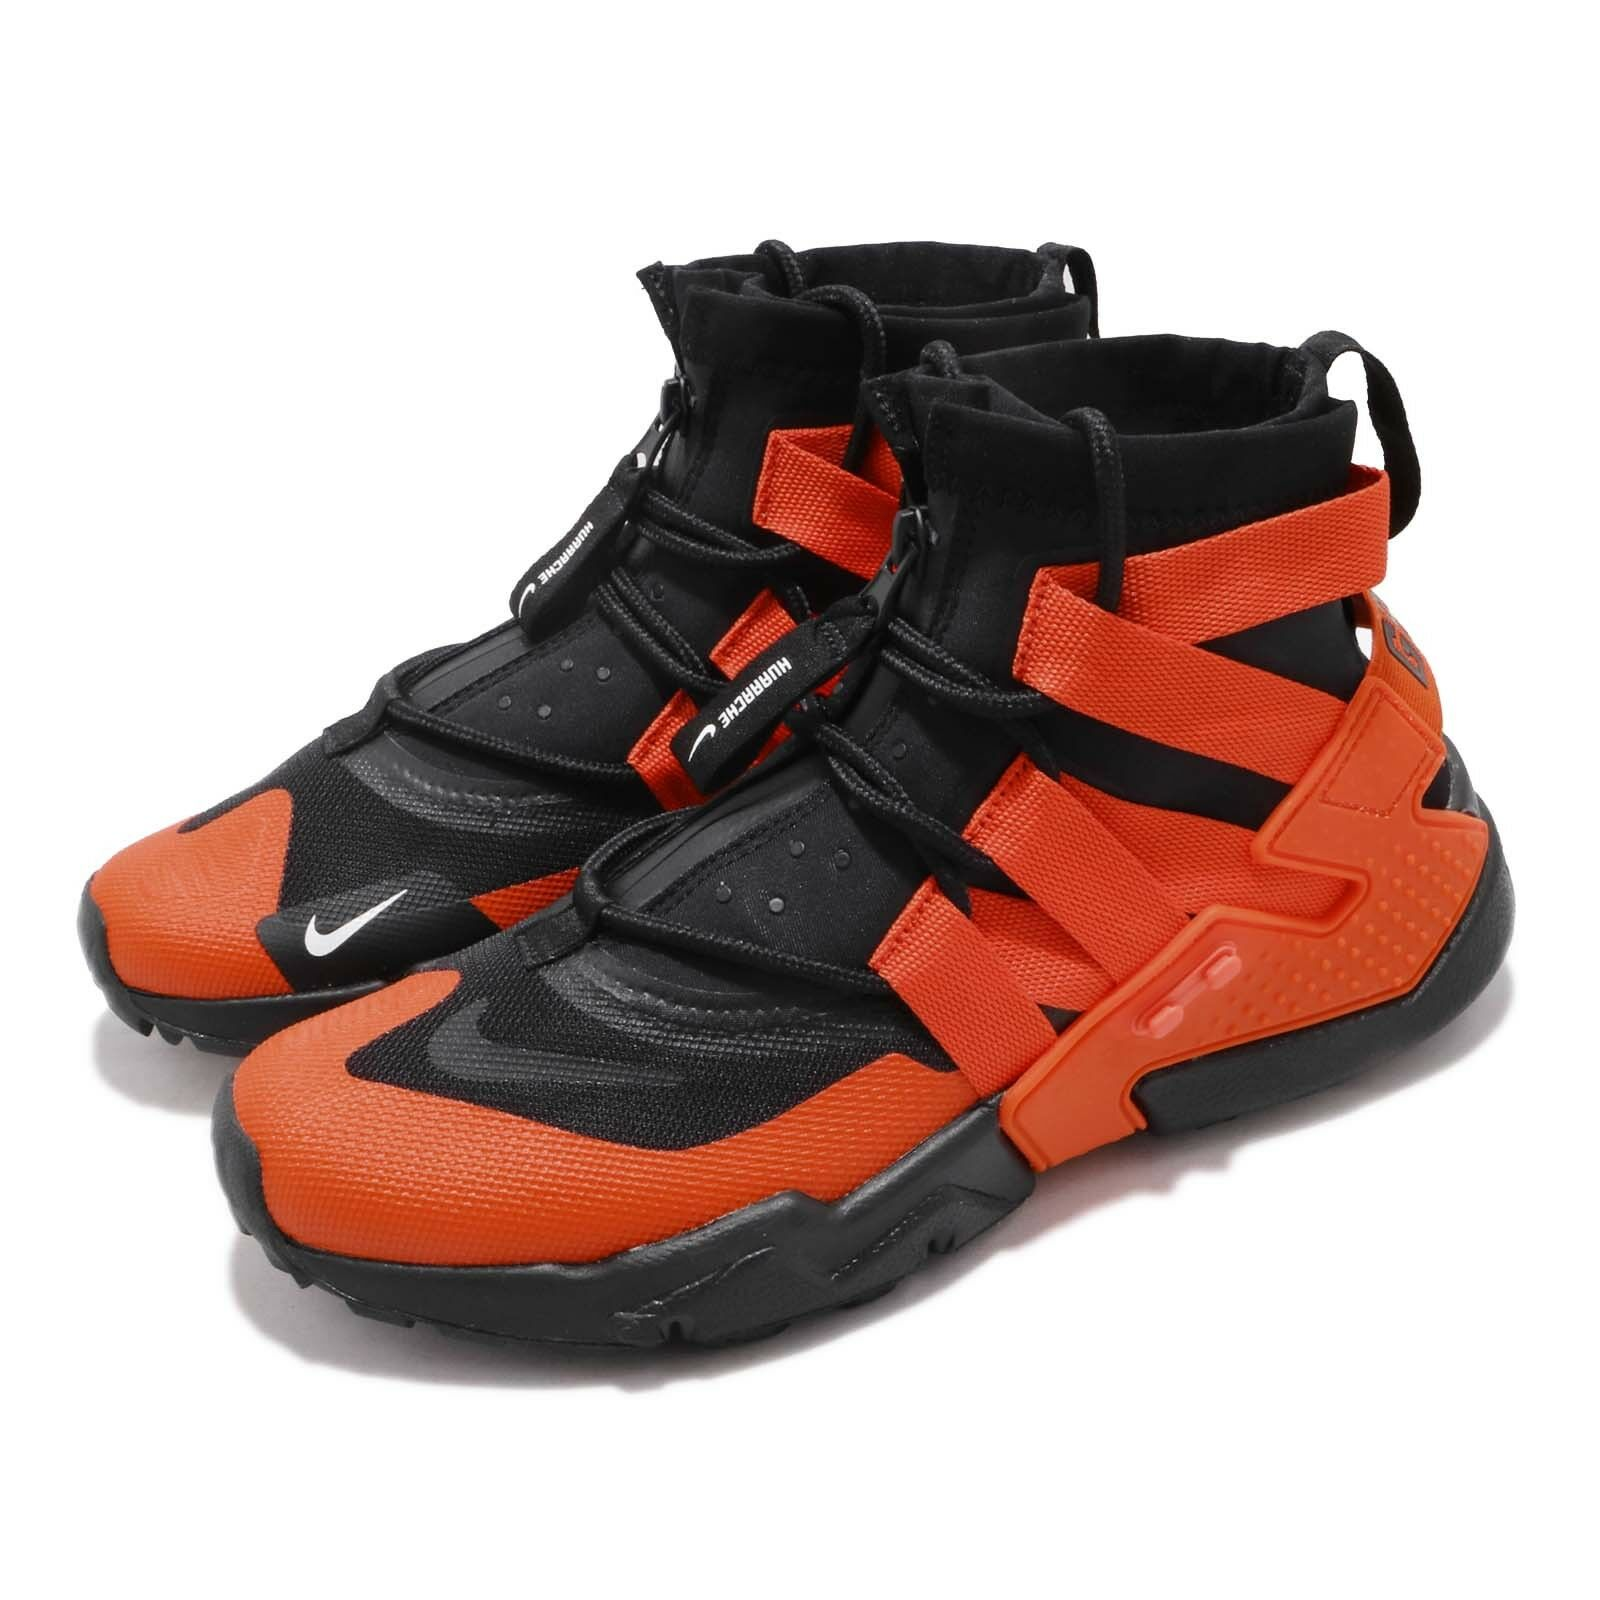 Nike Air Huarache Gripp Black Team orange Men Running shoes Sneakers AO1730-001